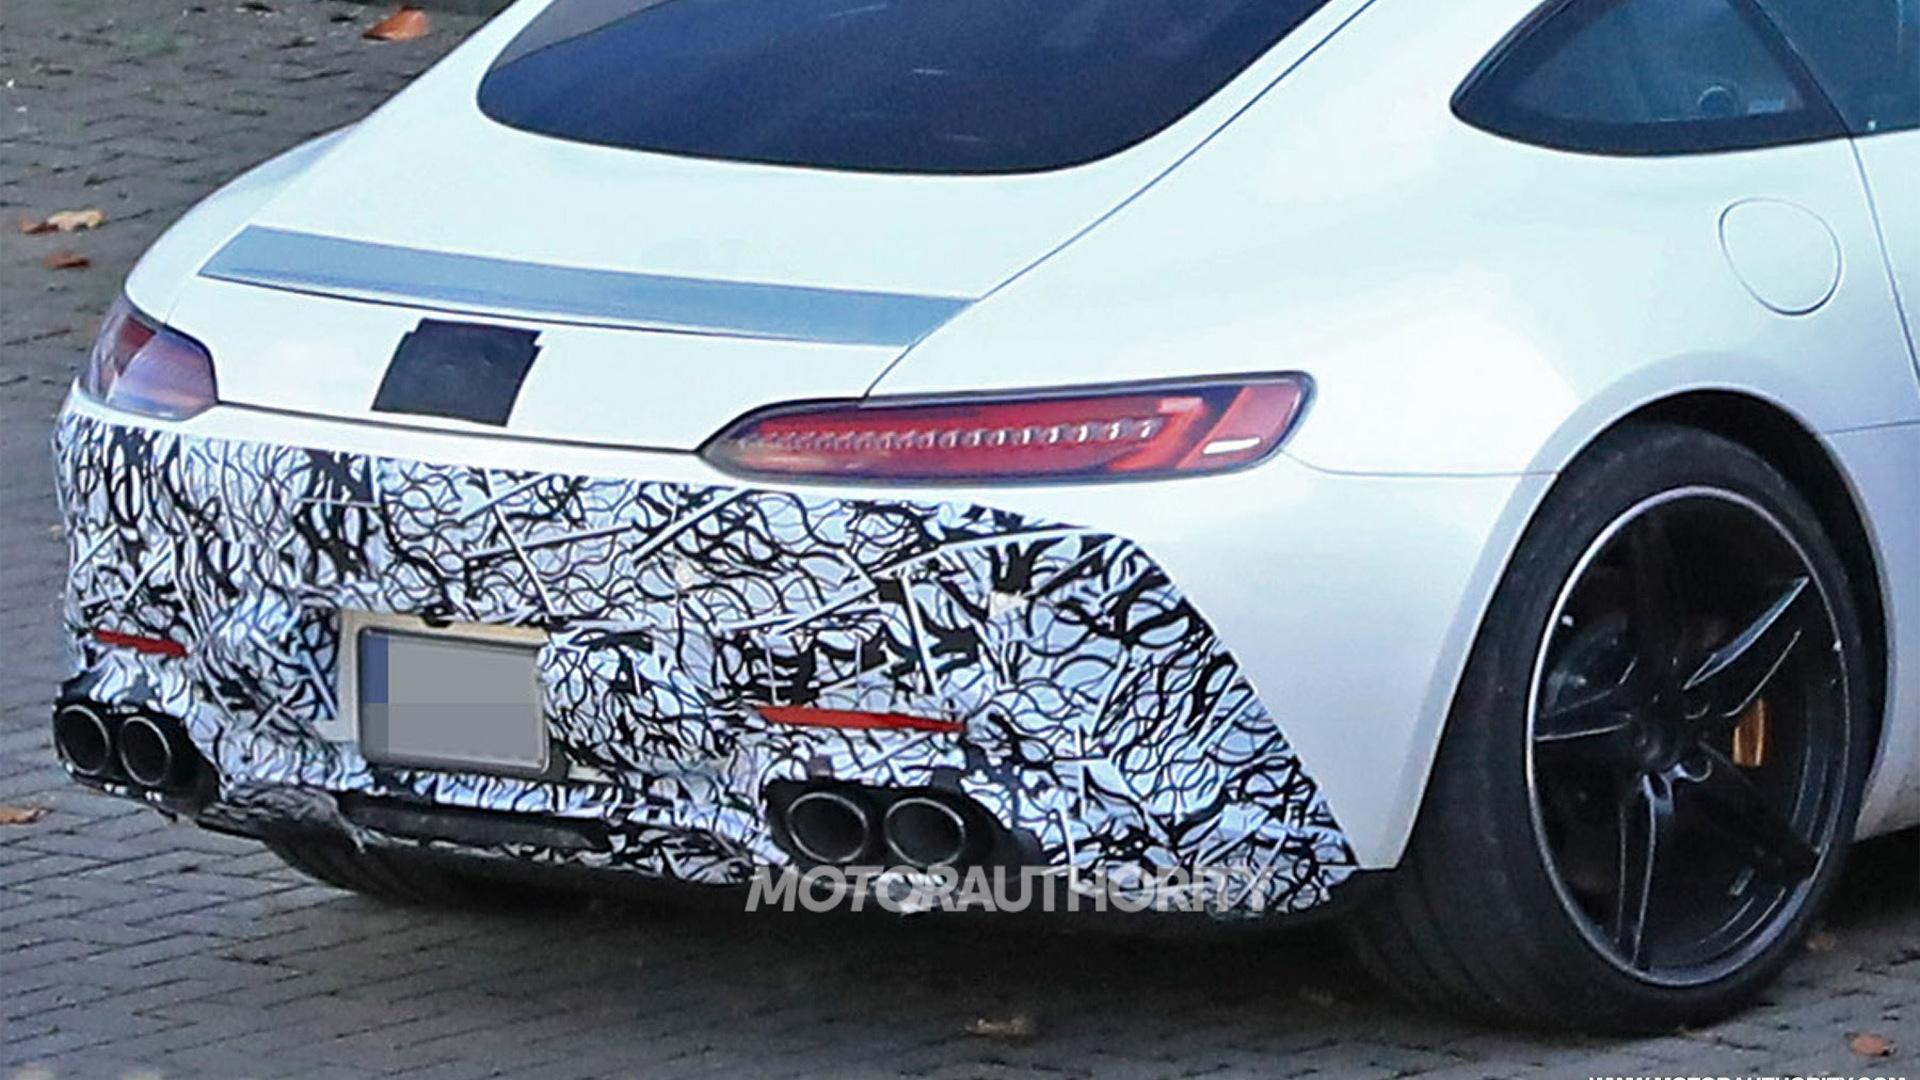 Potential six-cylinder Mercedes-AMG GT spy shots - S. Baldauf/SB-Medien